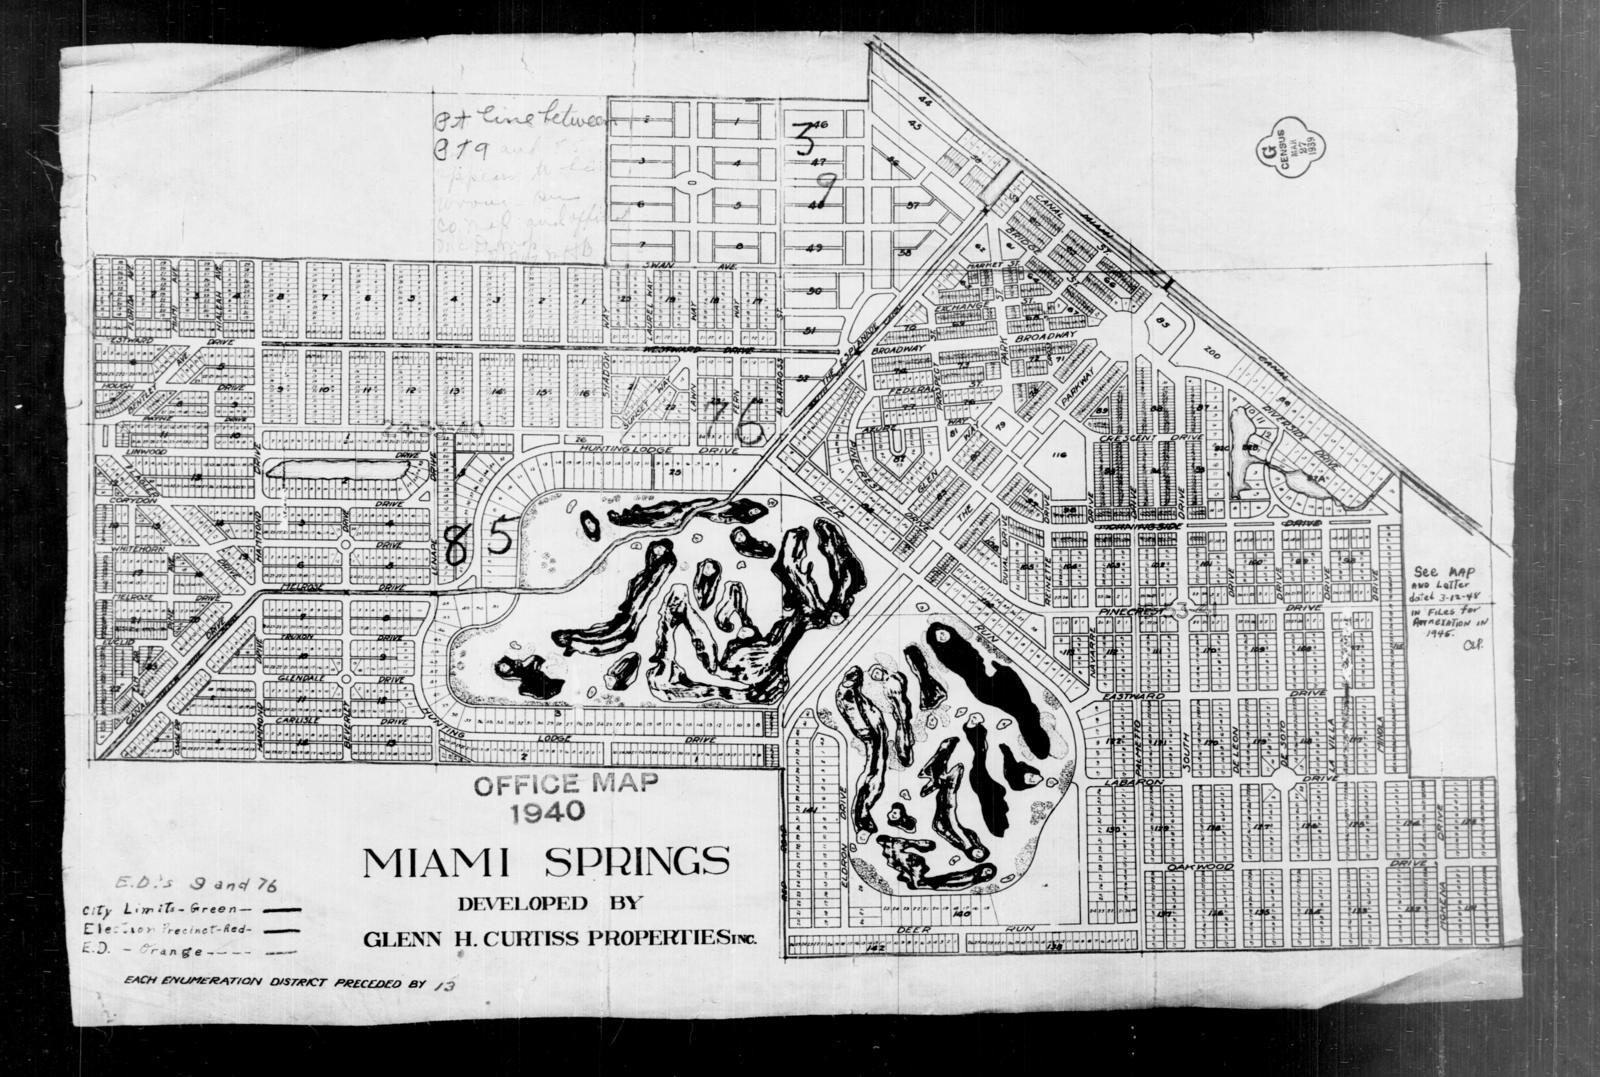 Miami Springs Florida Map.1940 Census Enumeration District Maps Florida Dade County